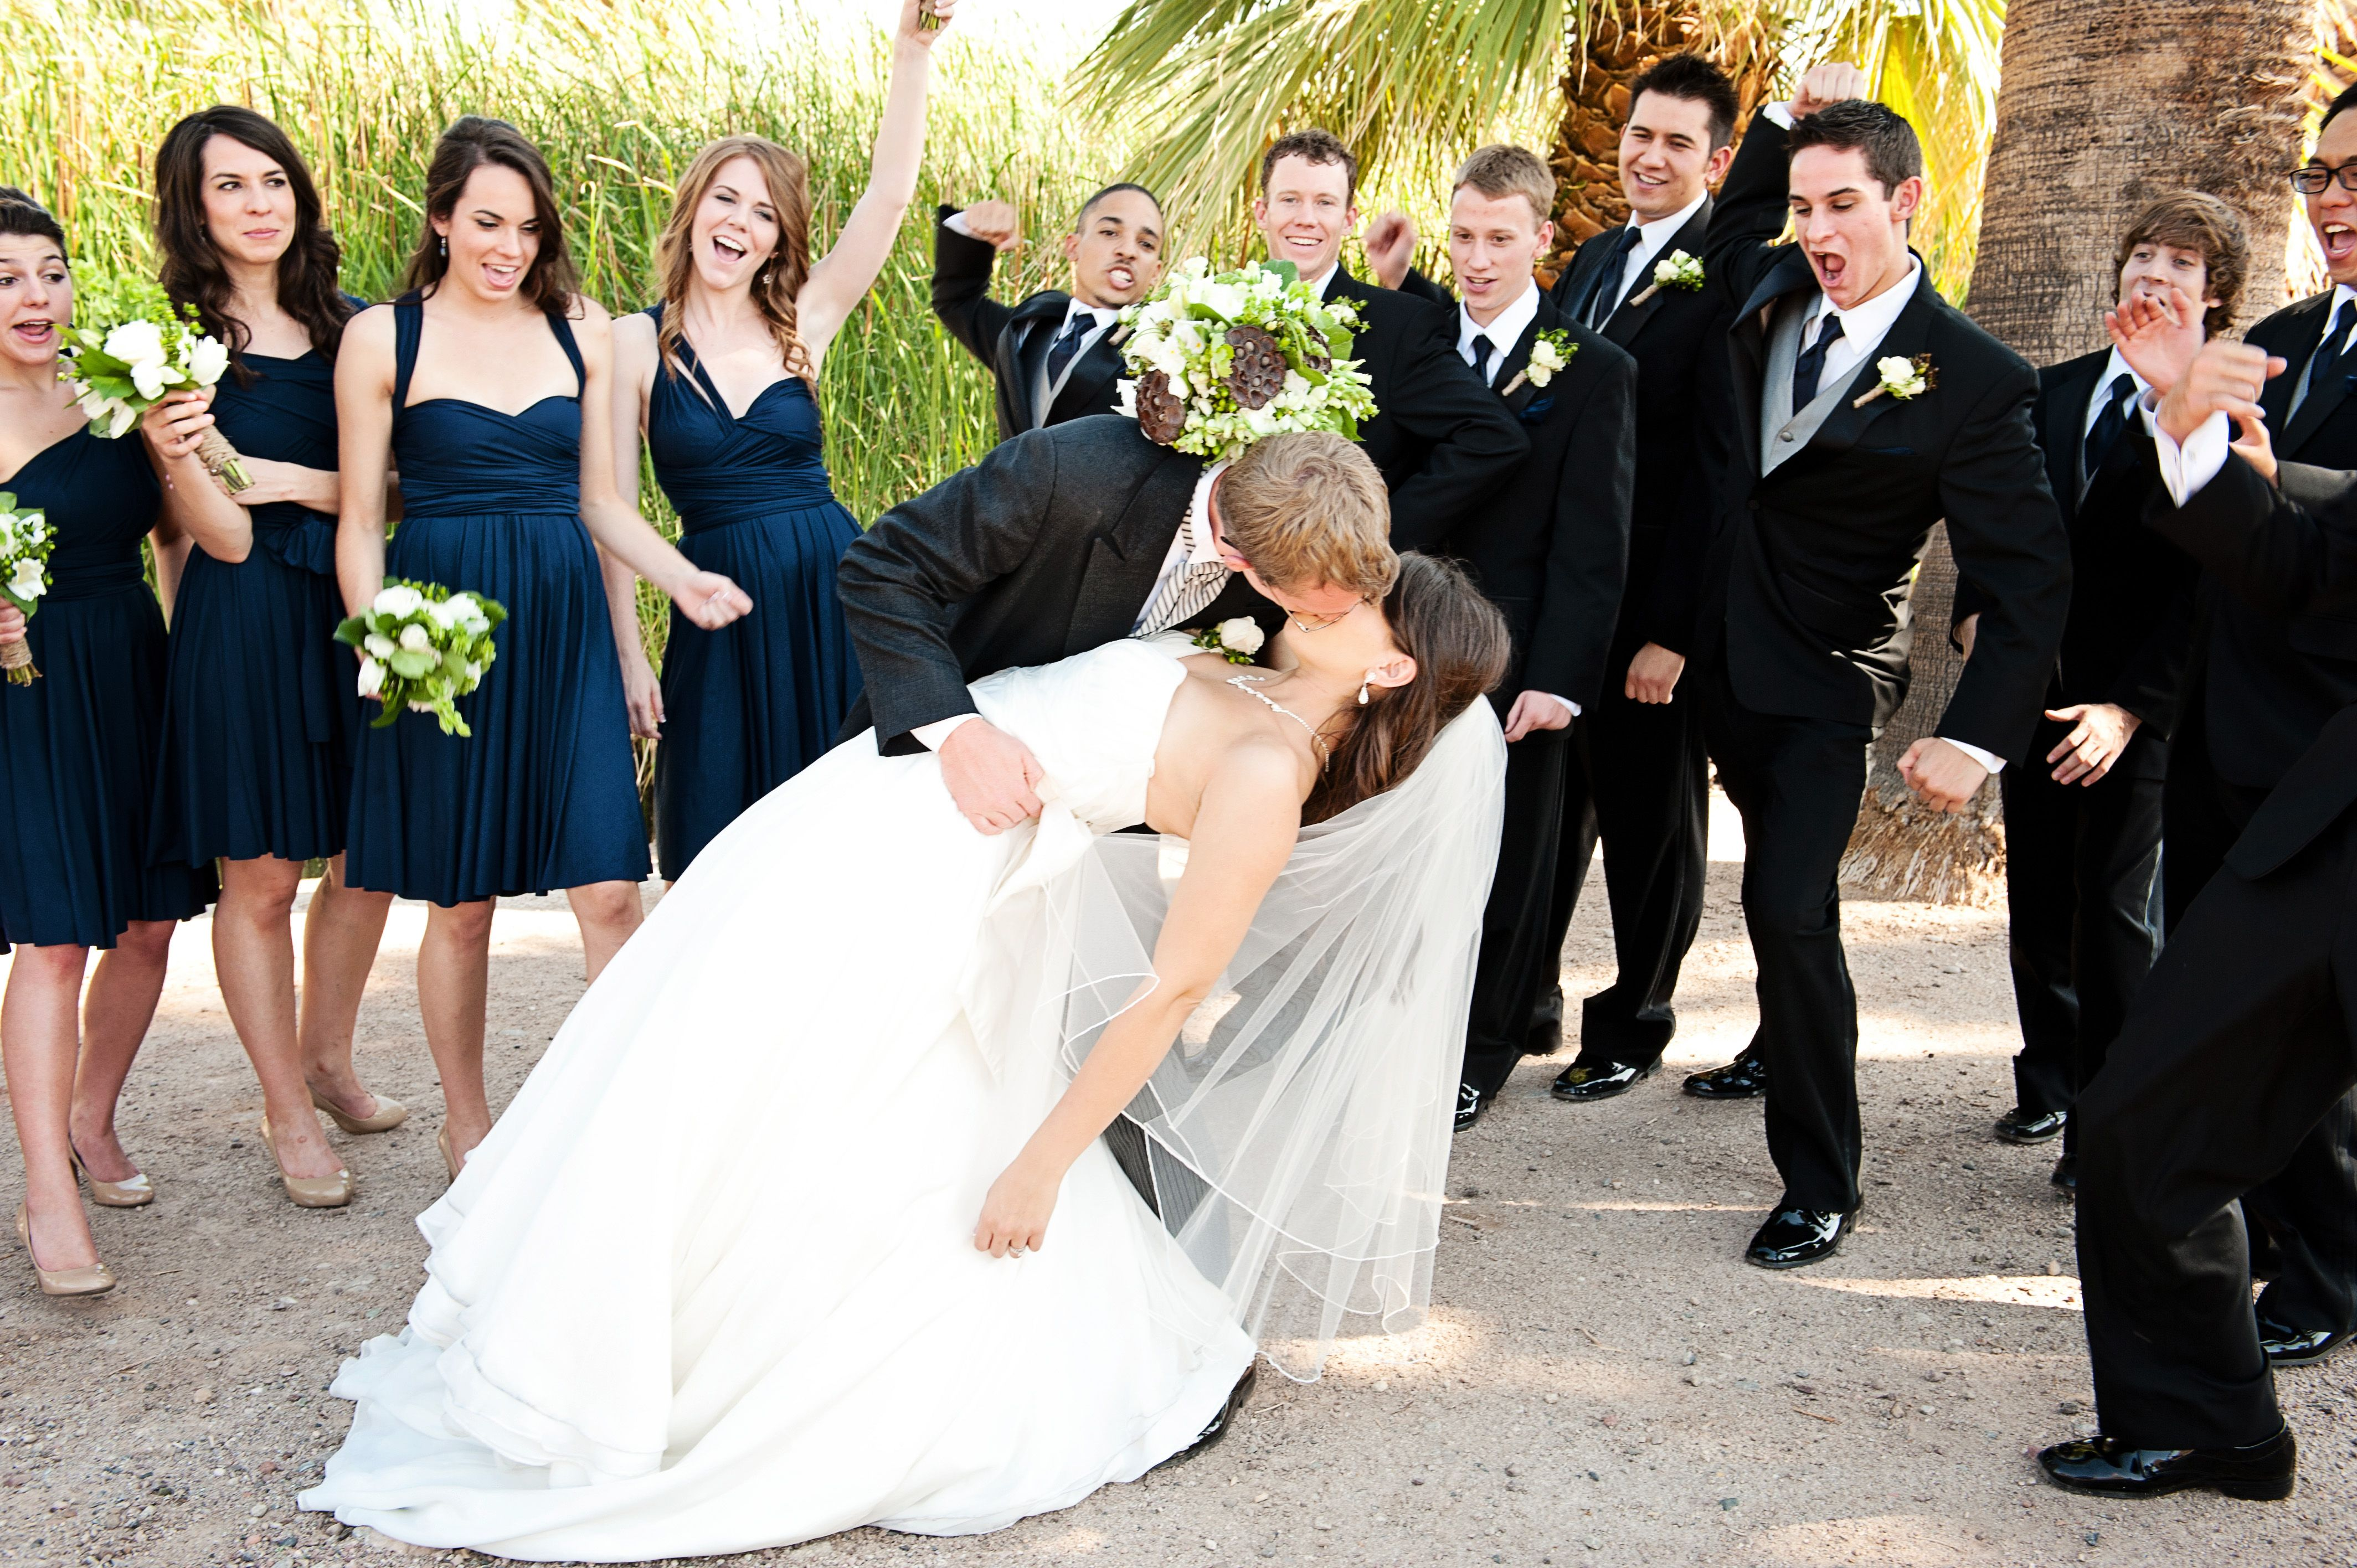 Bridal party navy bridesmaid dresses wrap dress black navy and navy bridesmaid dresses wrap dress black navy and grey tux ombrellifo Images